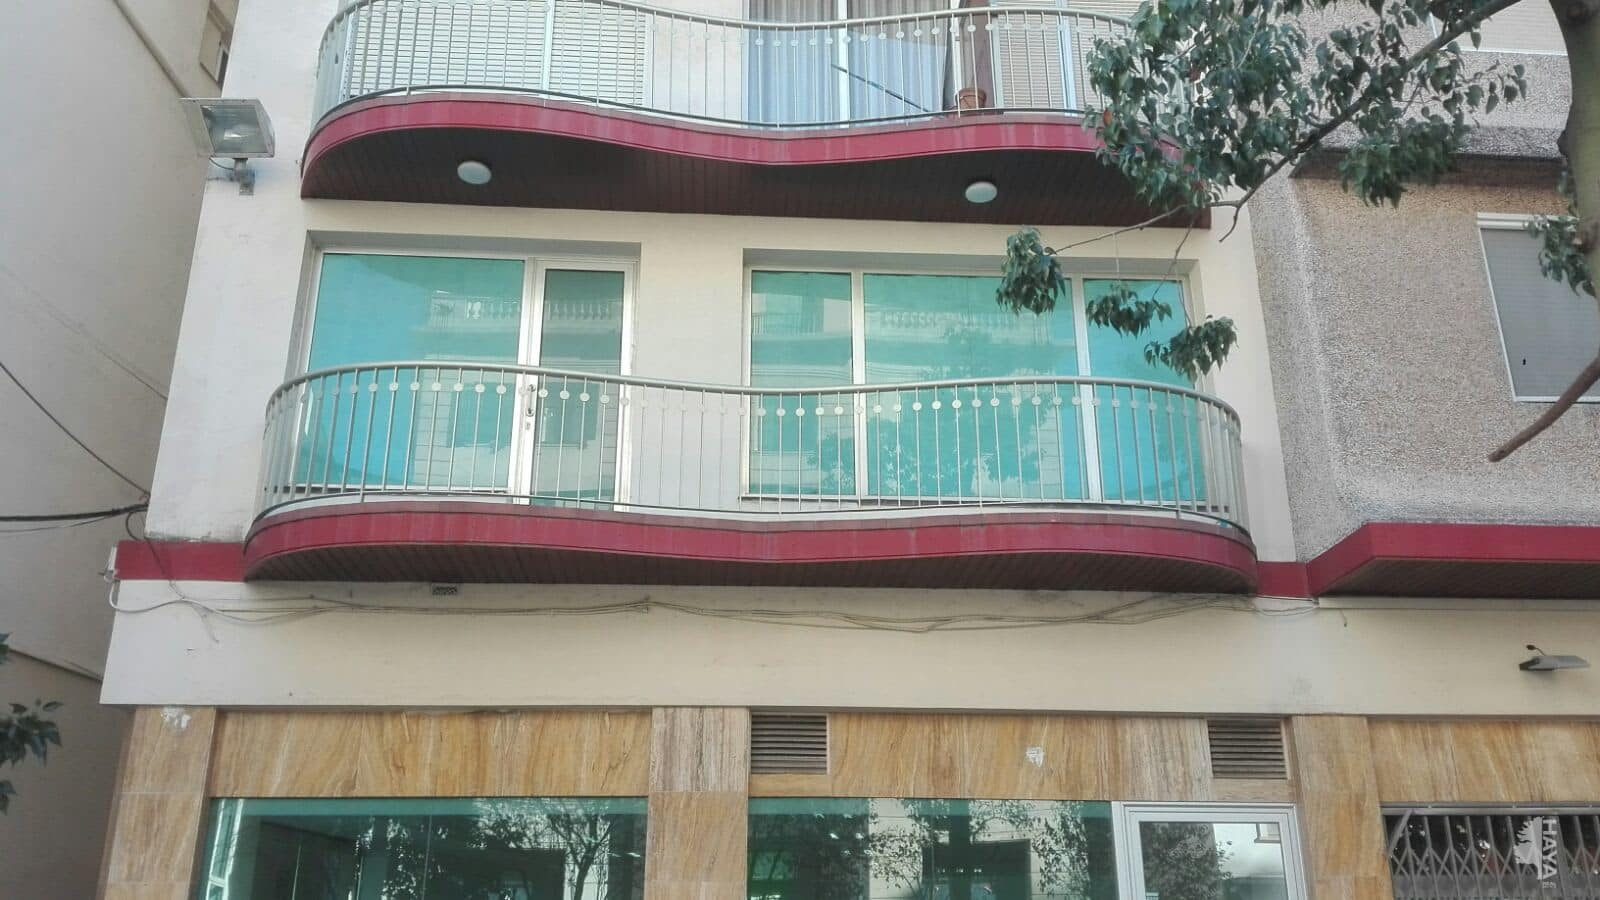 Piso en venta en Blanes, Girona, Calle Ample, 150.000 €, 102 m2